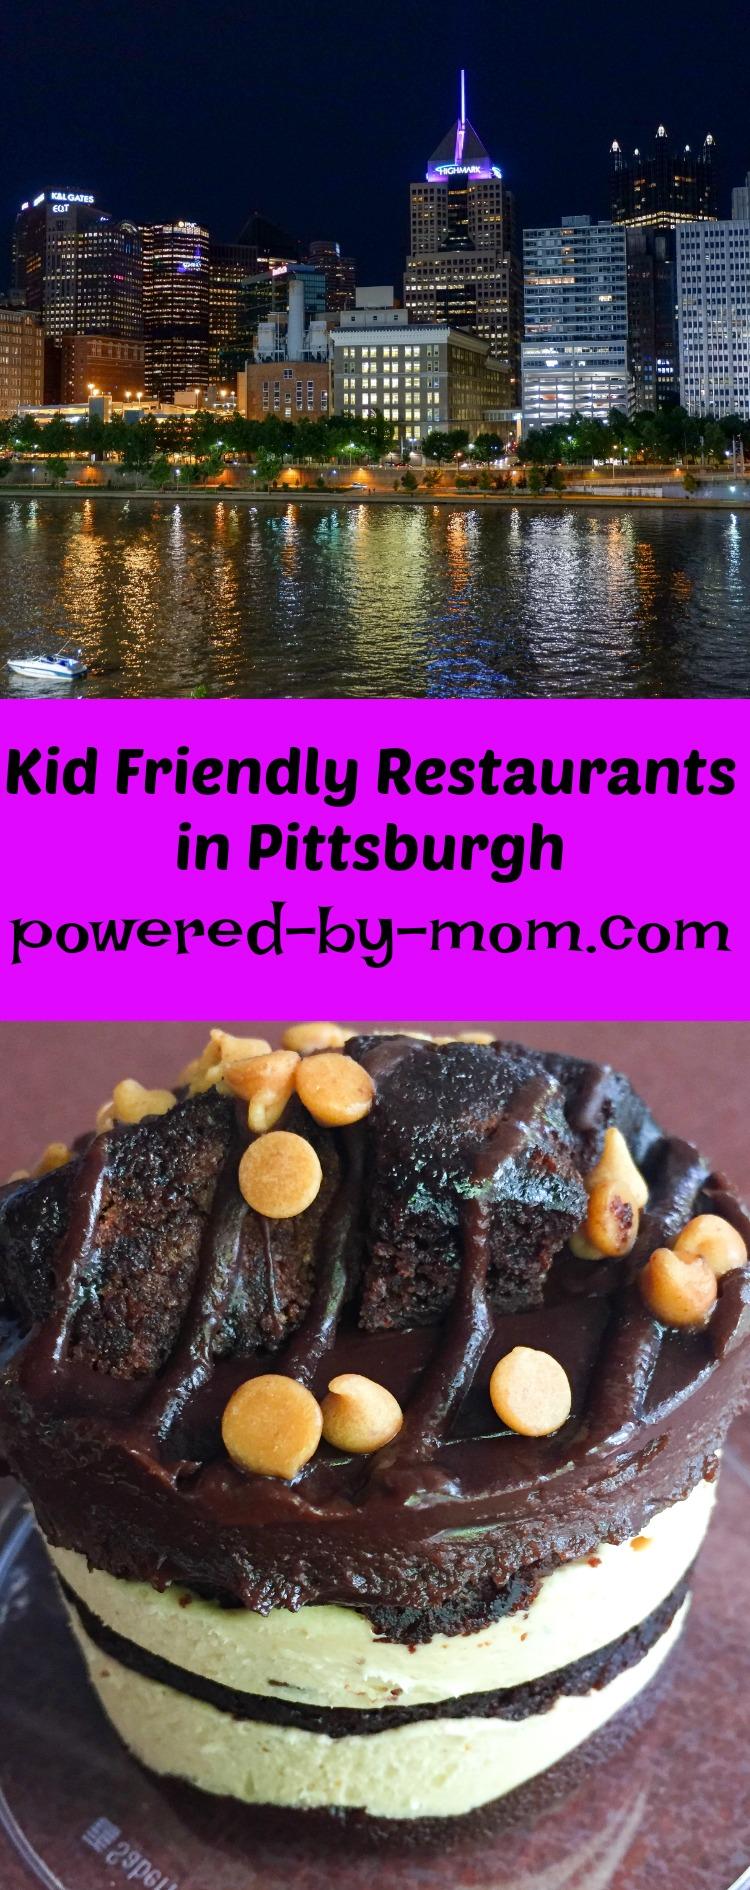 kid-friendly restaurants in Pittsburgh